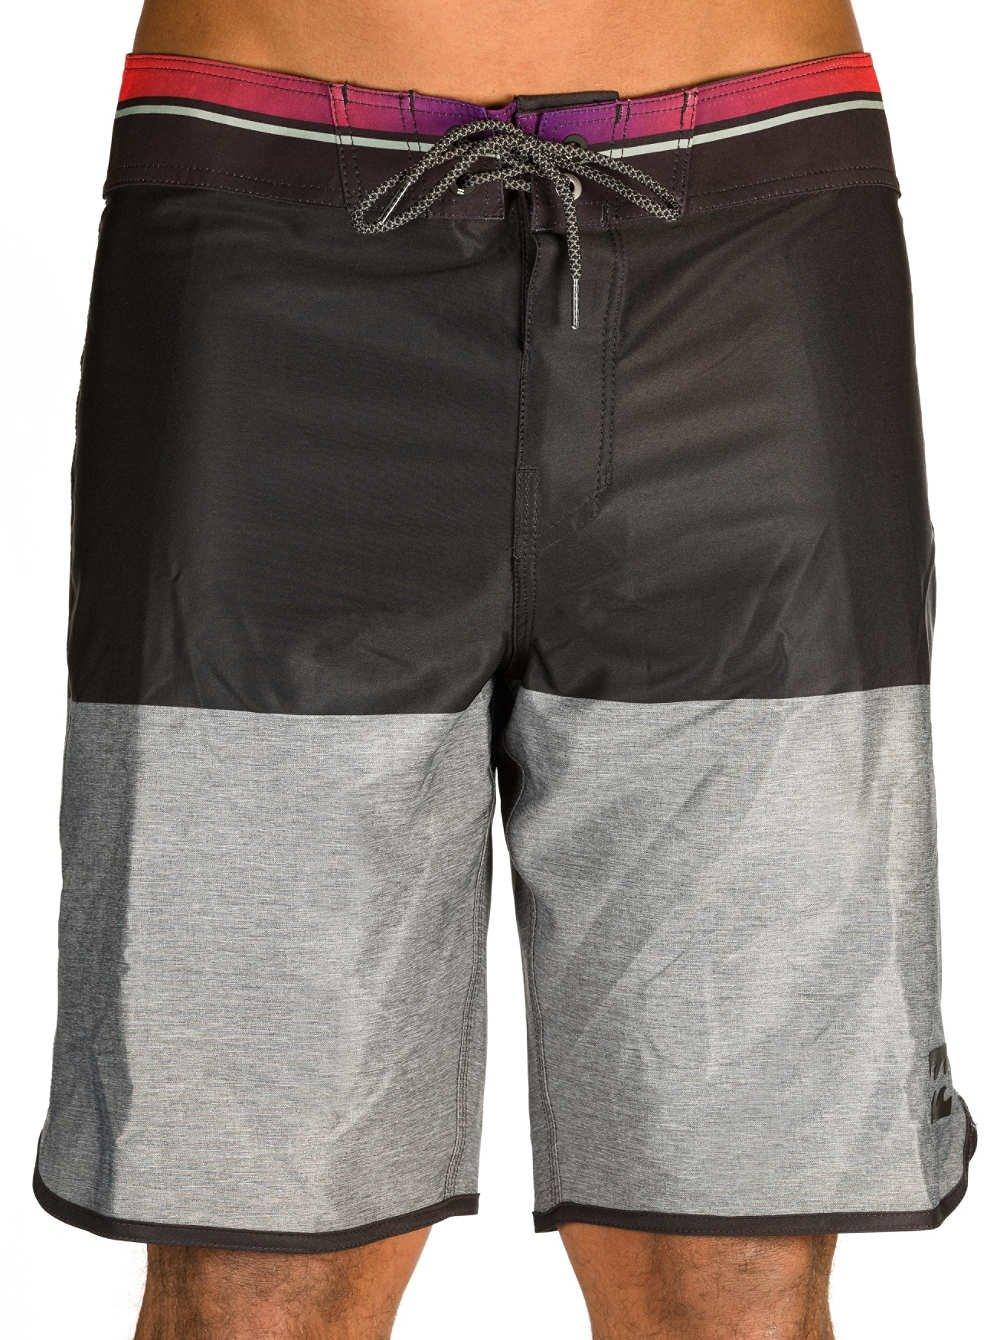 Billabong Herren Boardshorts Fifty50 X 19 Boardshorts